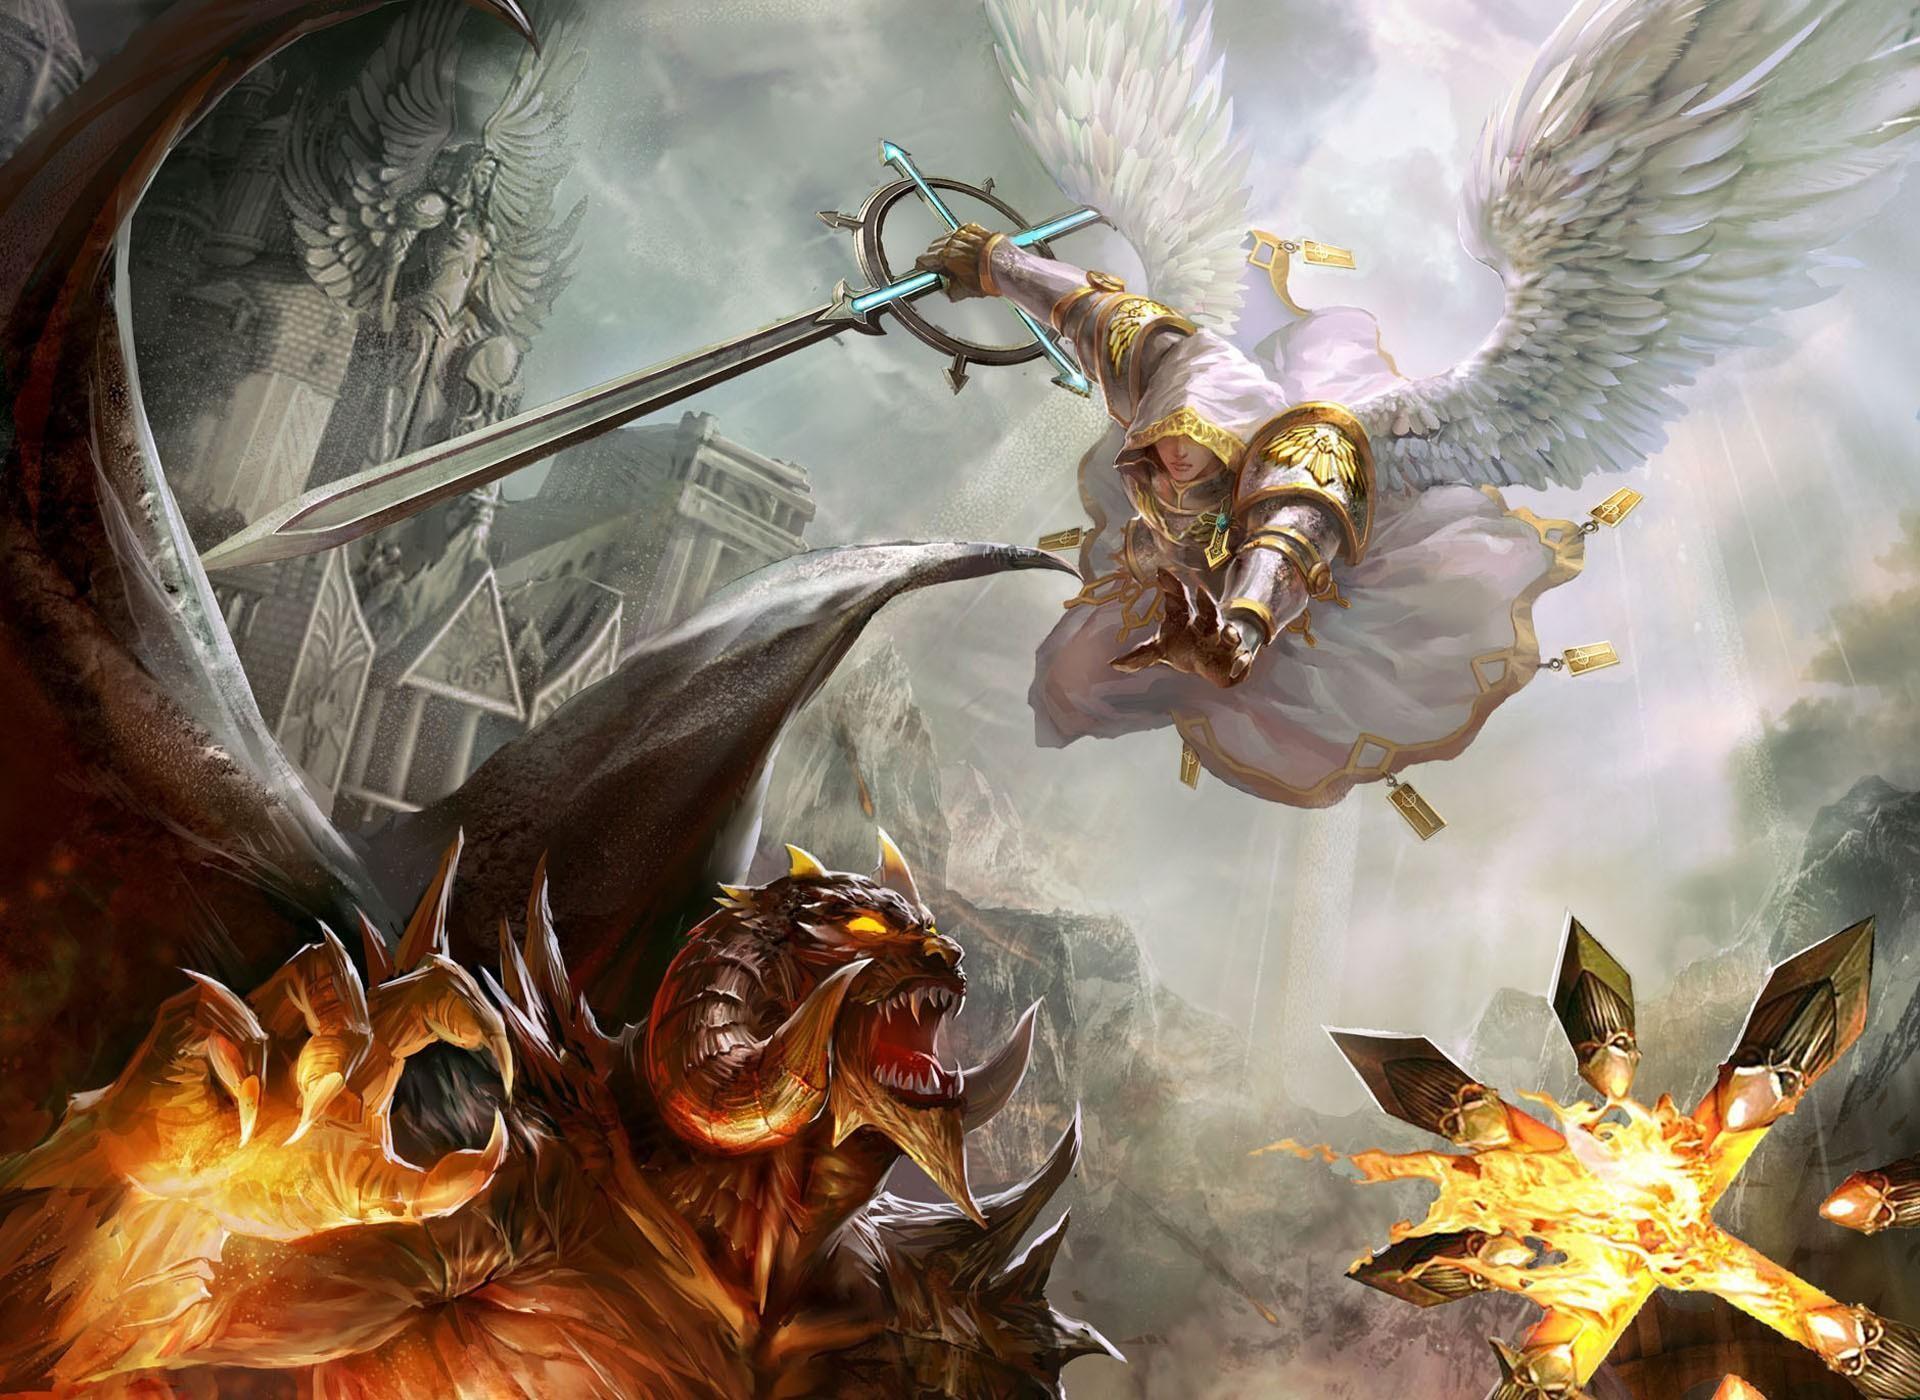 Dragonborn The Elder Scrolls V: Skyrim fire mage tails wallpaper